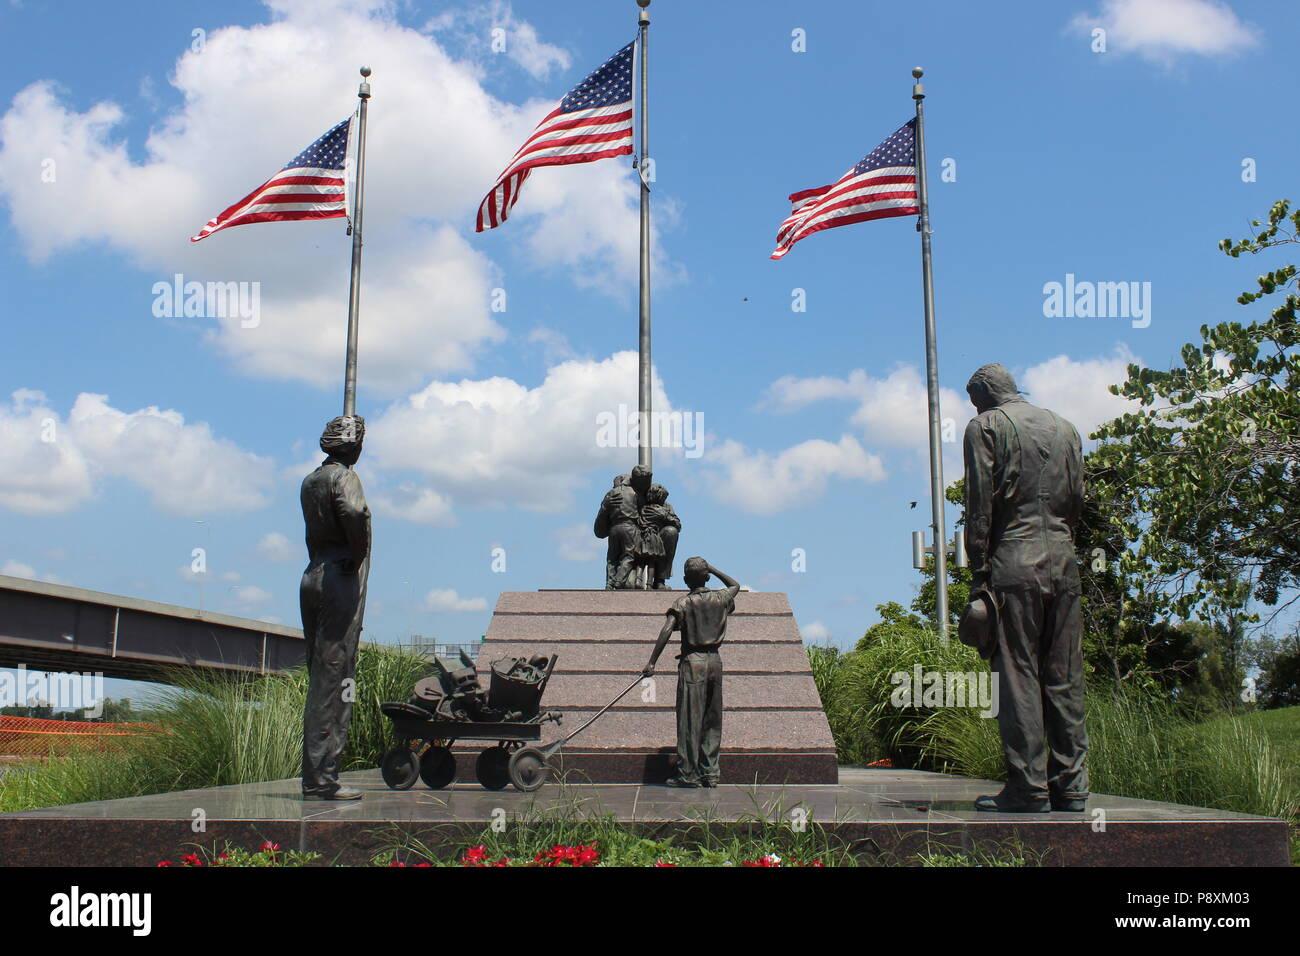 War memorial, Heartland of America Park, Omaha, Nebraska Stock Photo